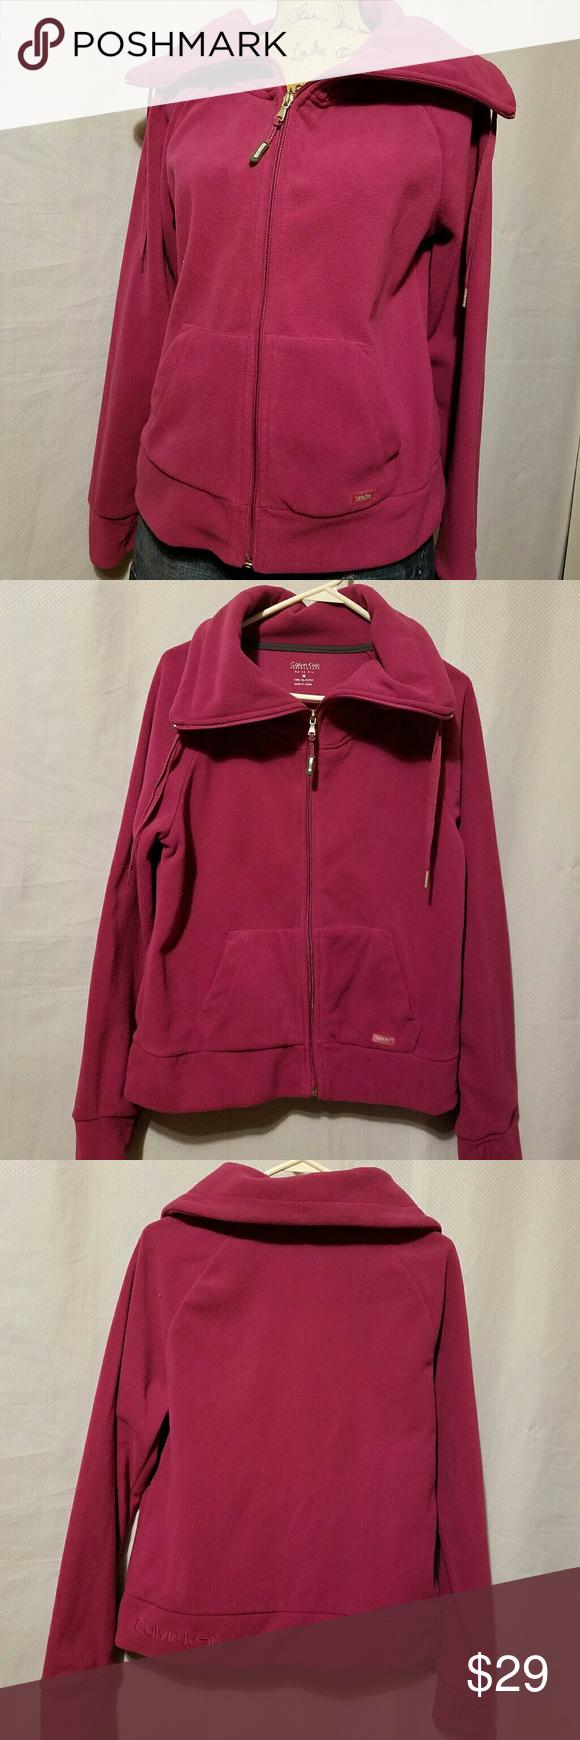 Calvin klein fleece jackets conditioning coats and customer support